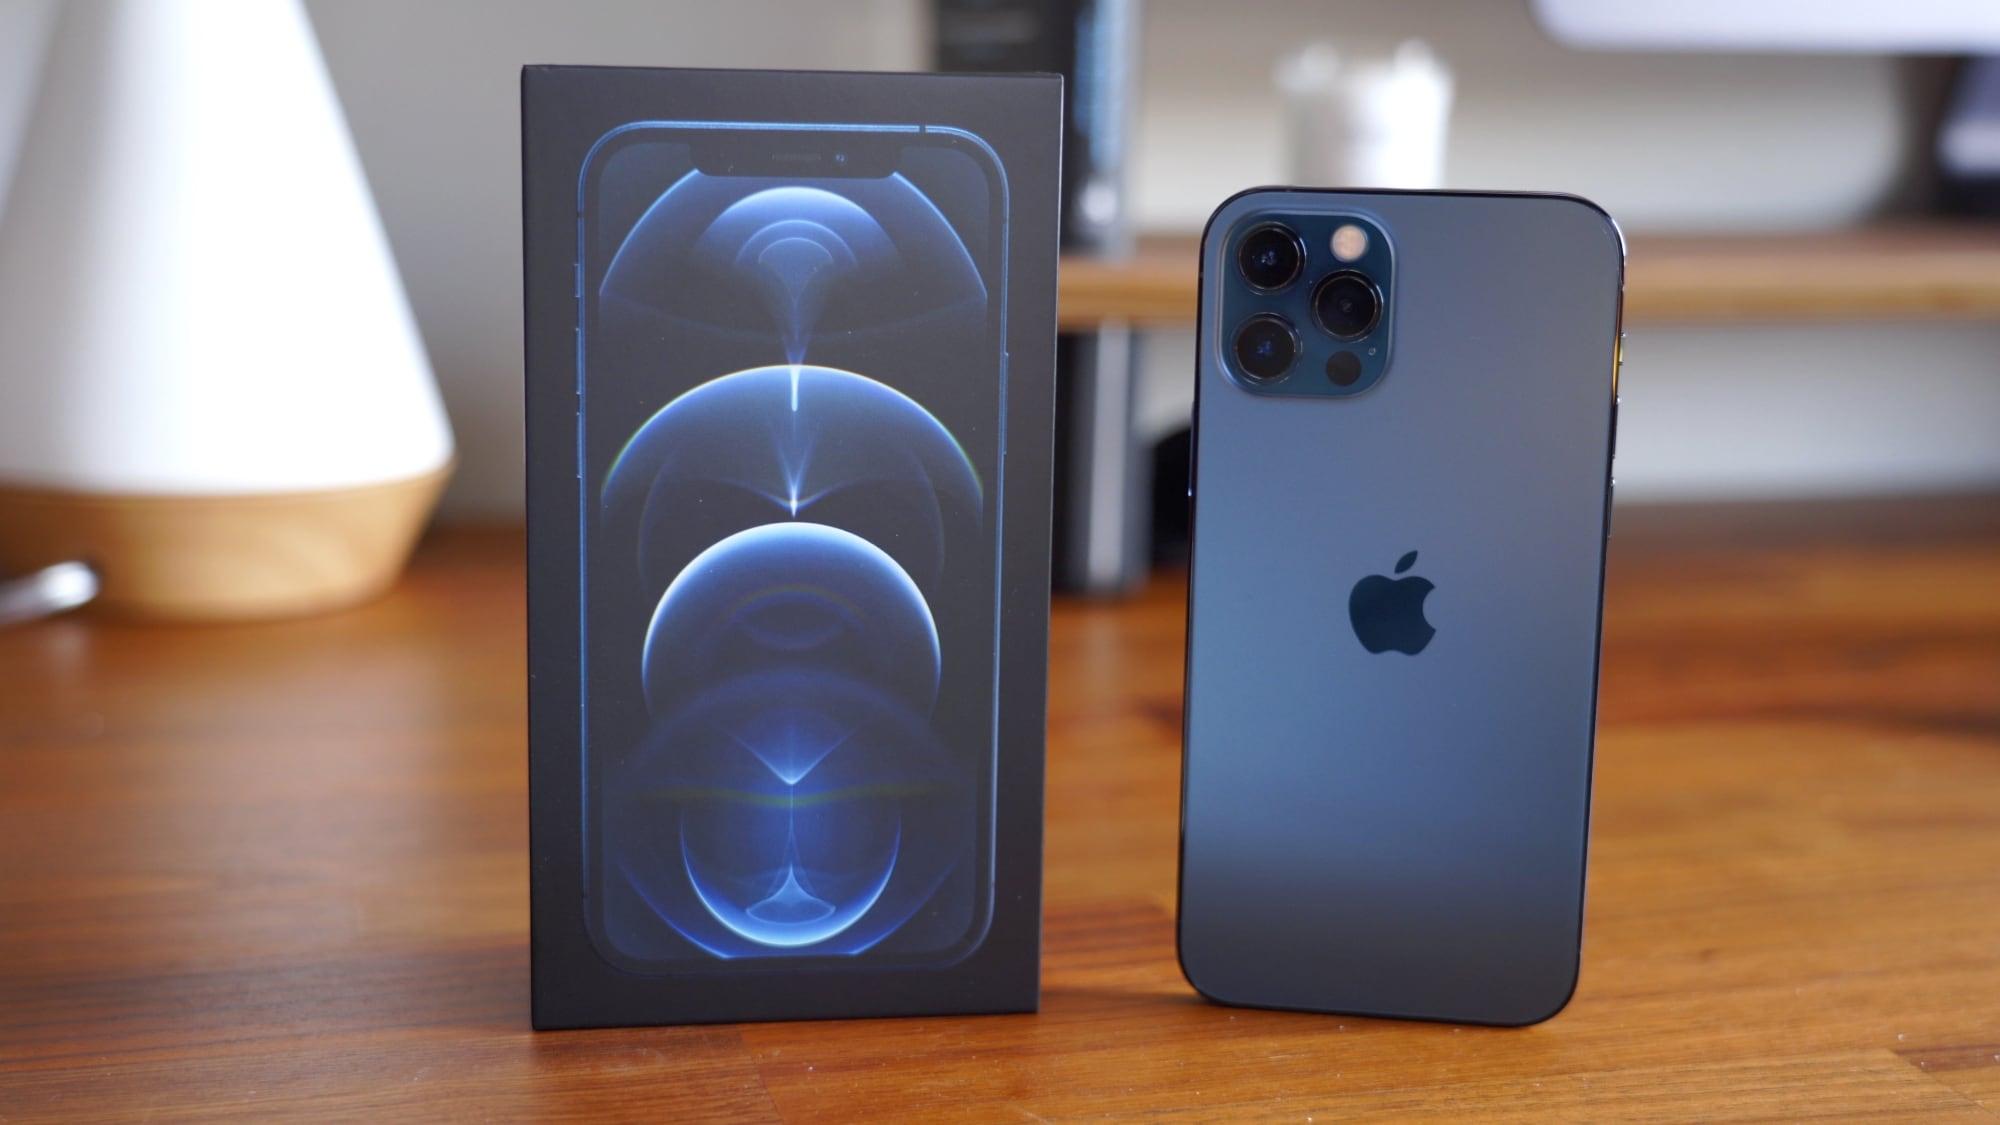 iphone12proandbox-1.jpg